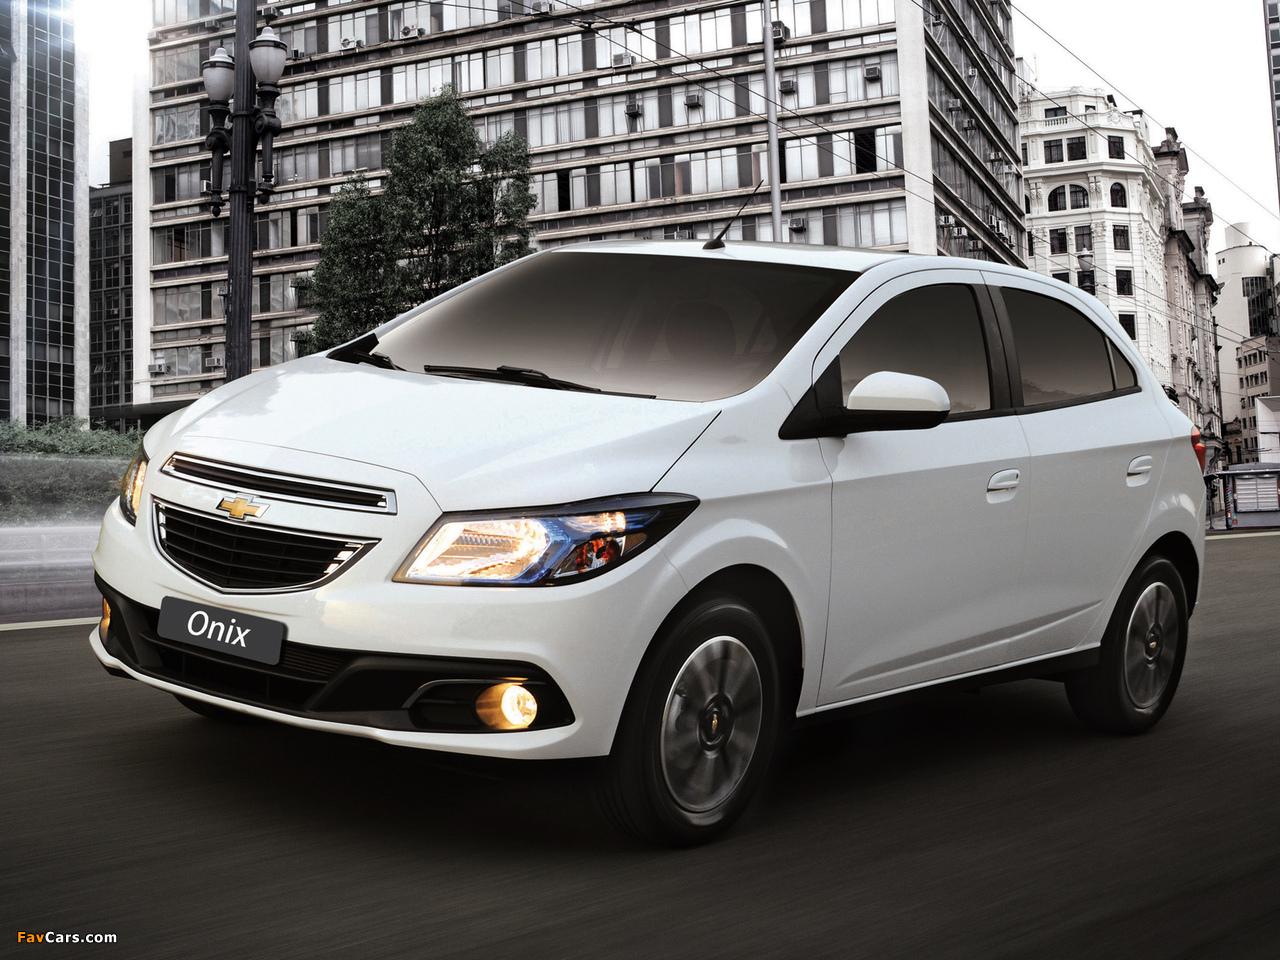 Chevrolet Onix 2012 pictures (1280 x 960)